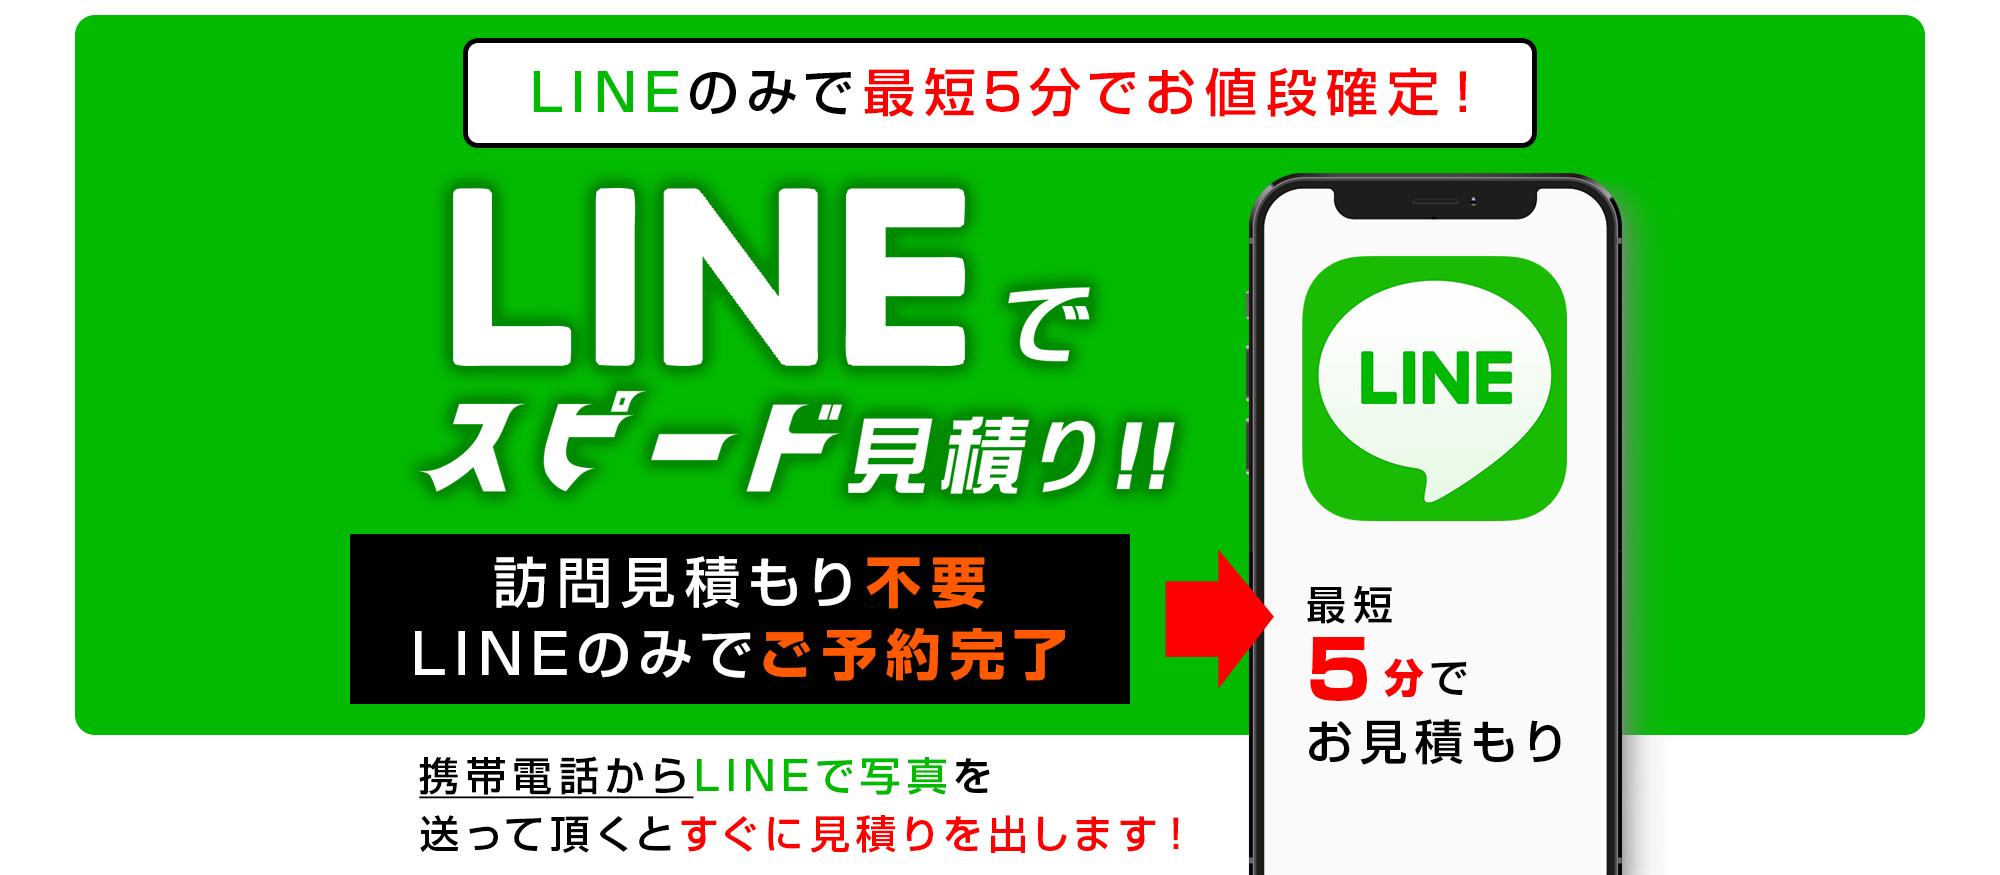 LINEでスピード見積り!!